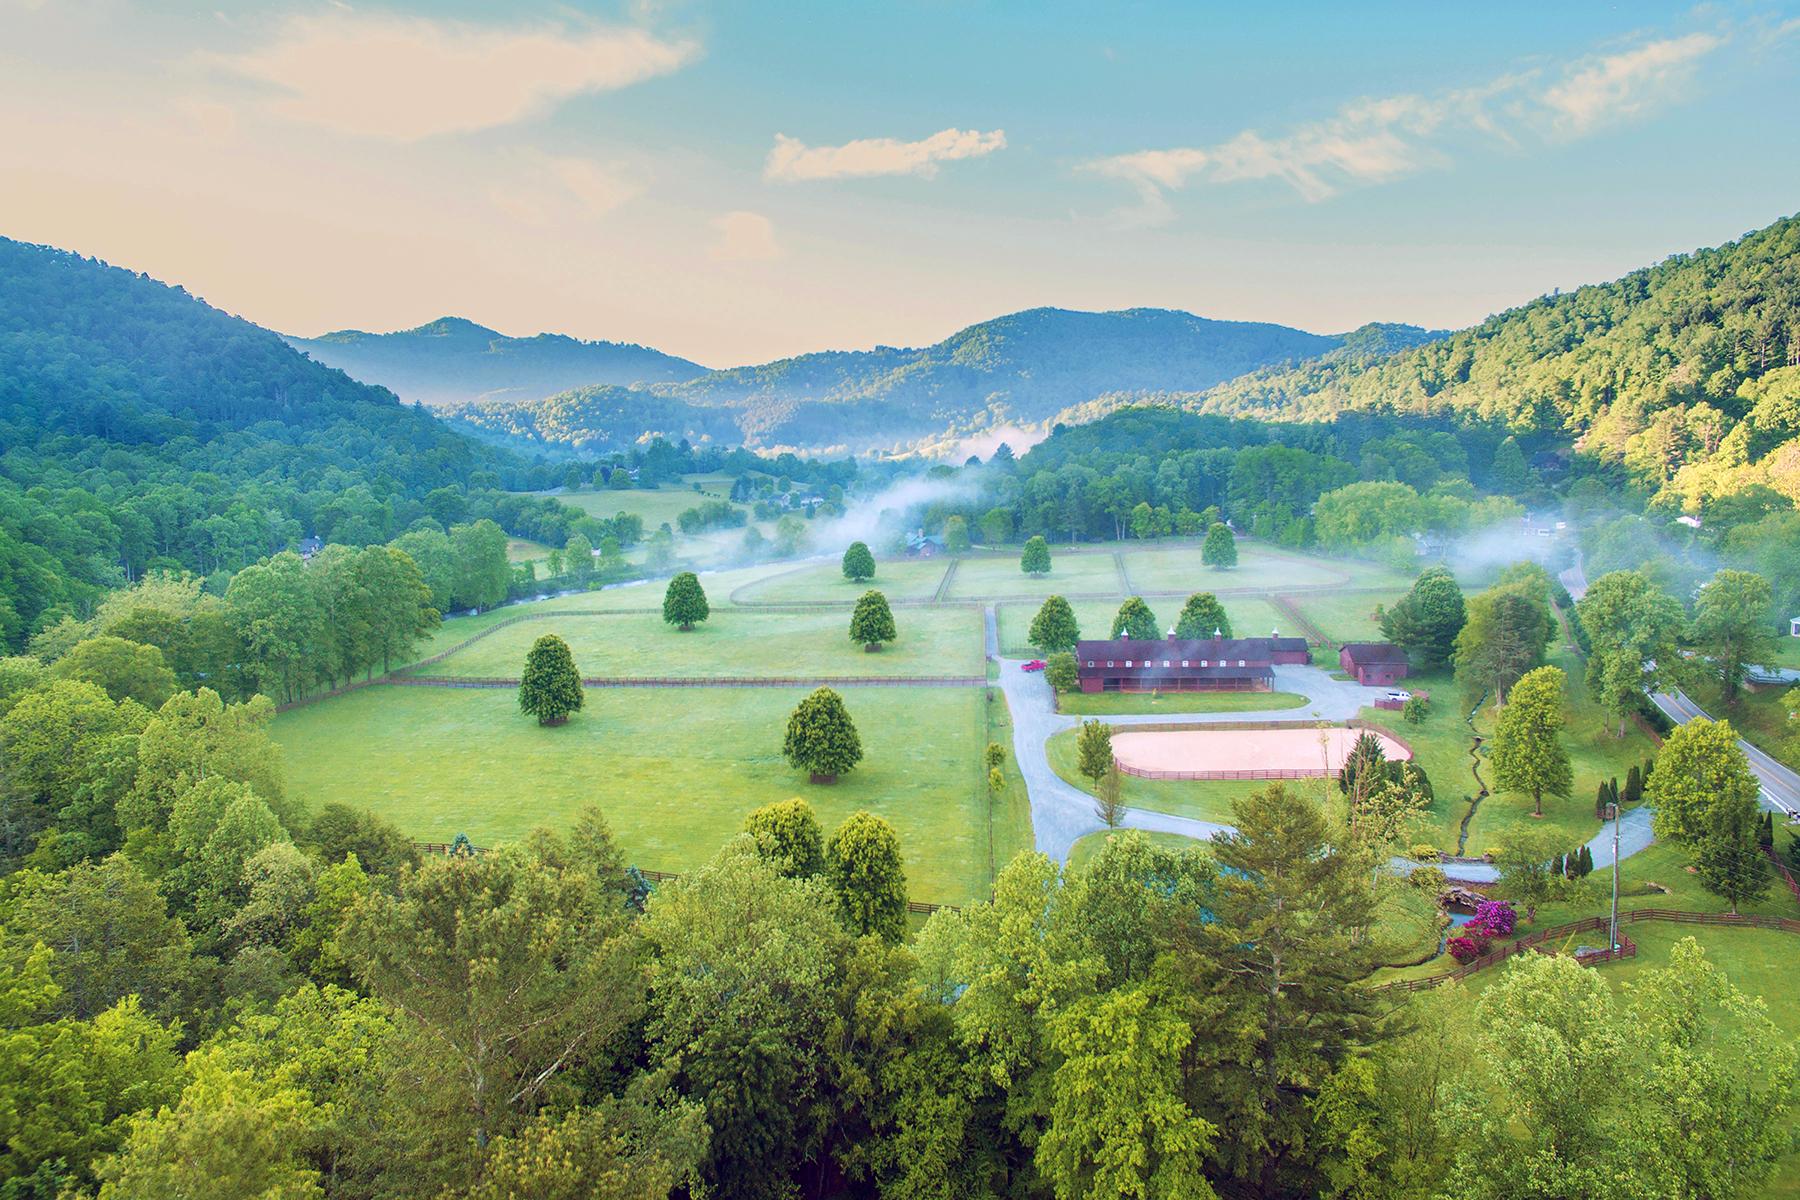 Single Family Homes for Sale at 2128 Broadstone 2128 2130 Broadstone Rd Banner Elk, North Carolina 28604 United States